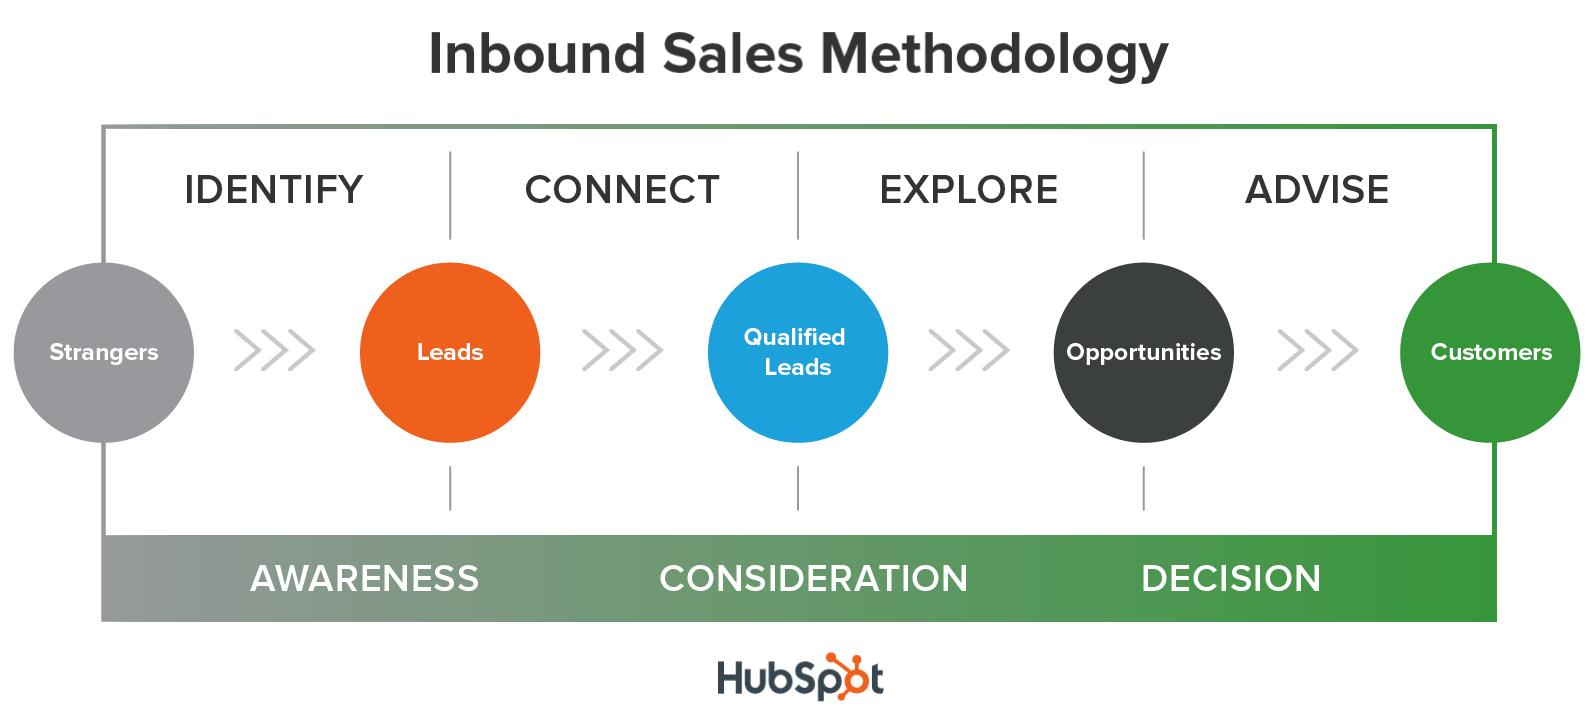 8 ways to pass hubspot academys inbound sales methodology inbound sales certification hubspot xflitez Images